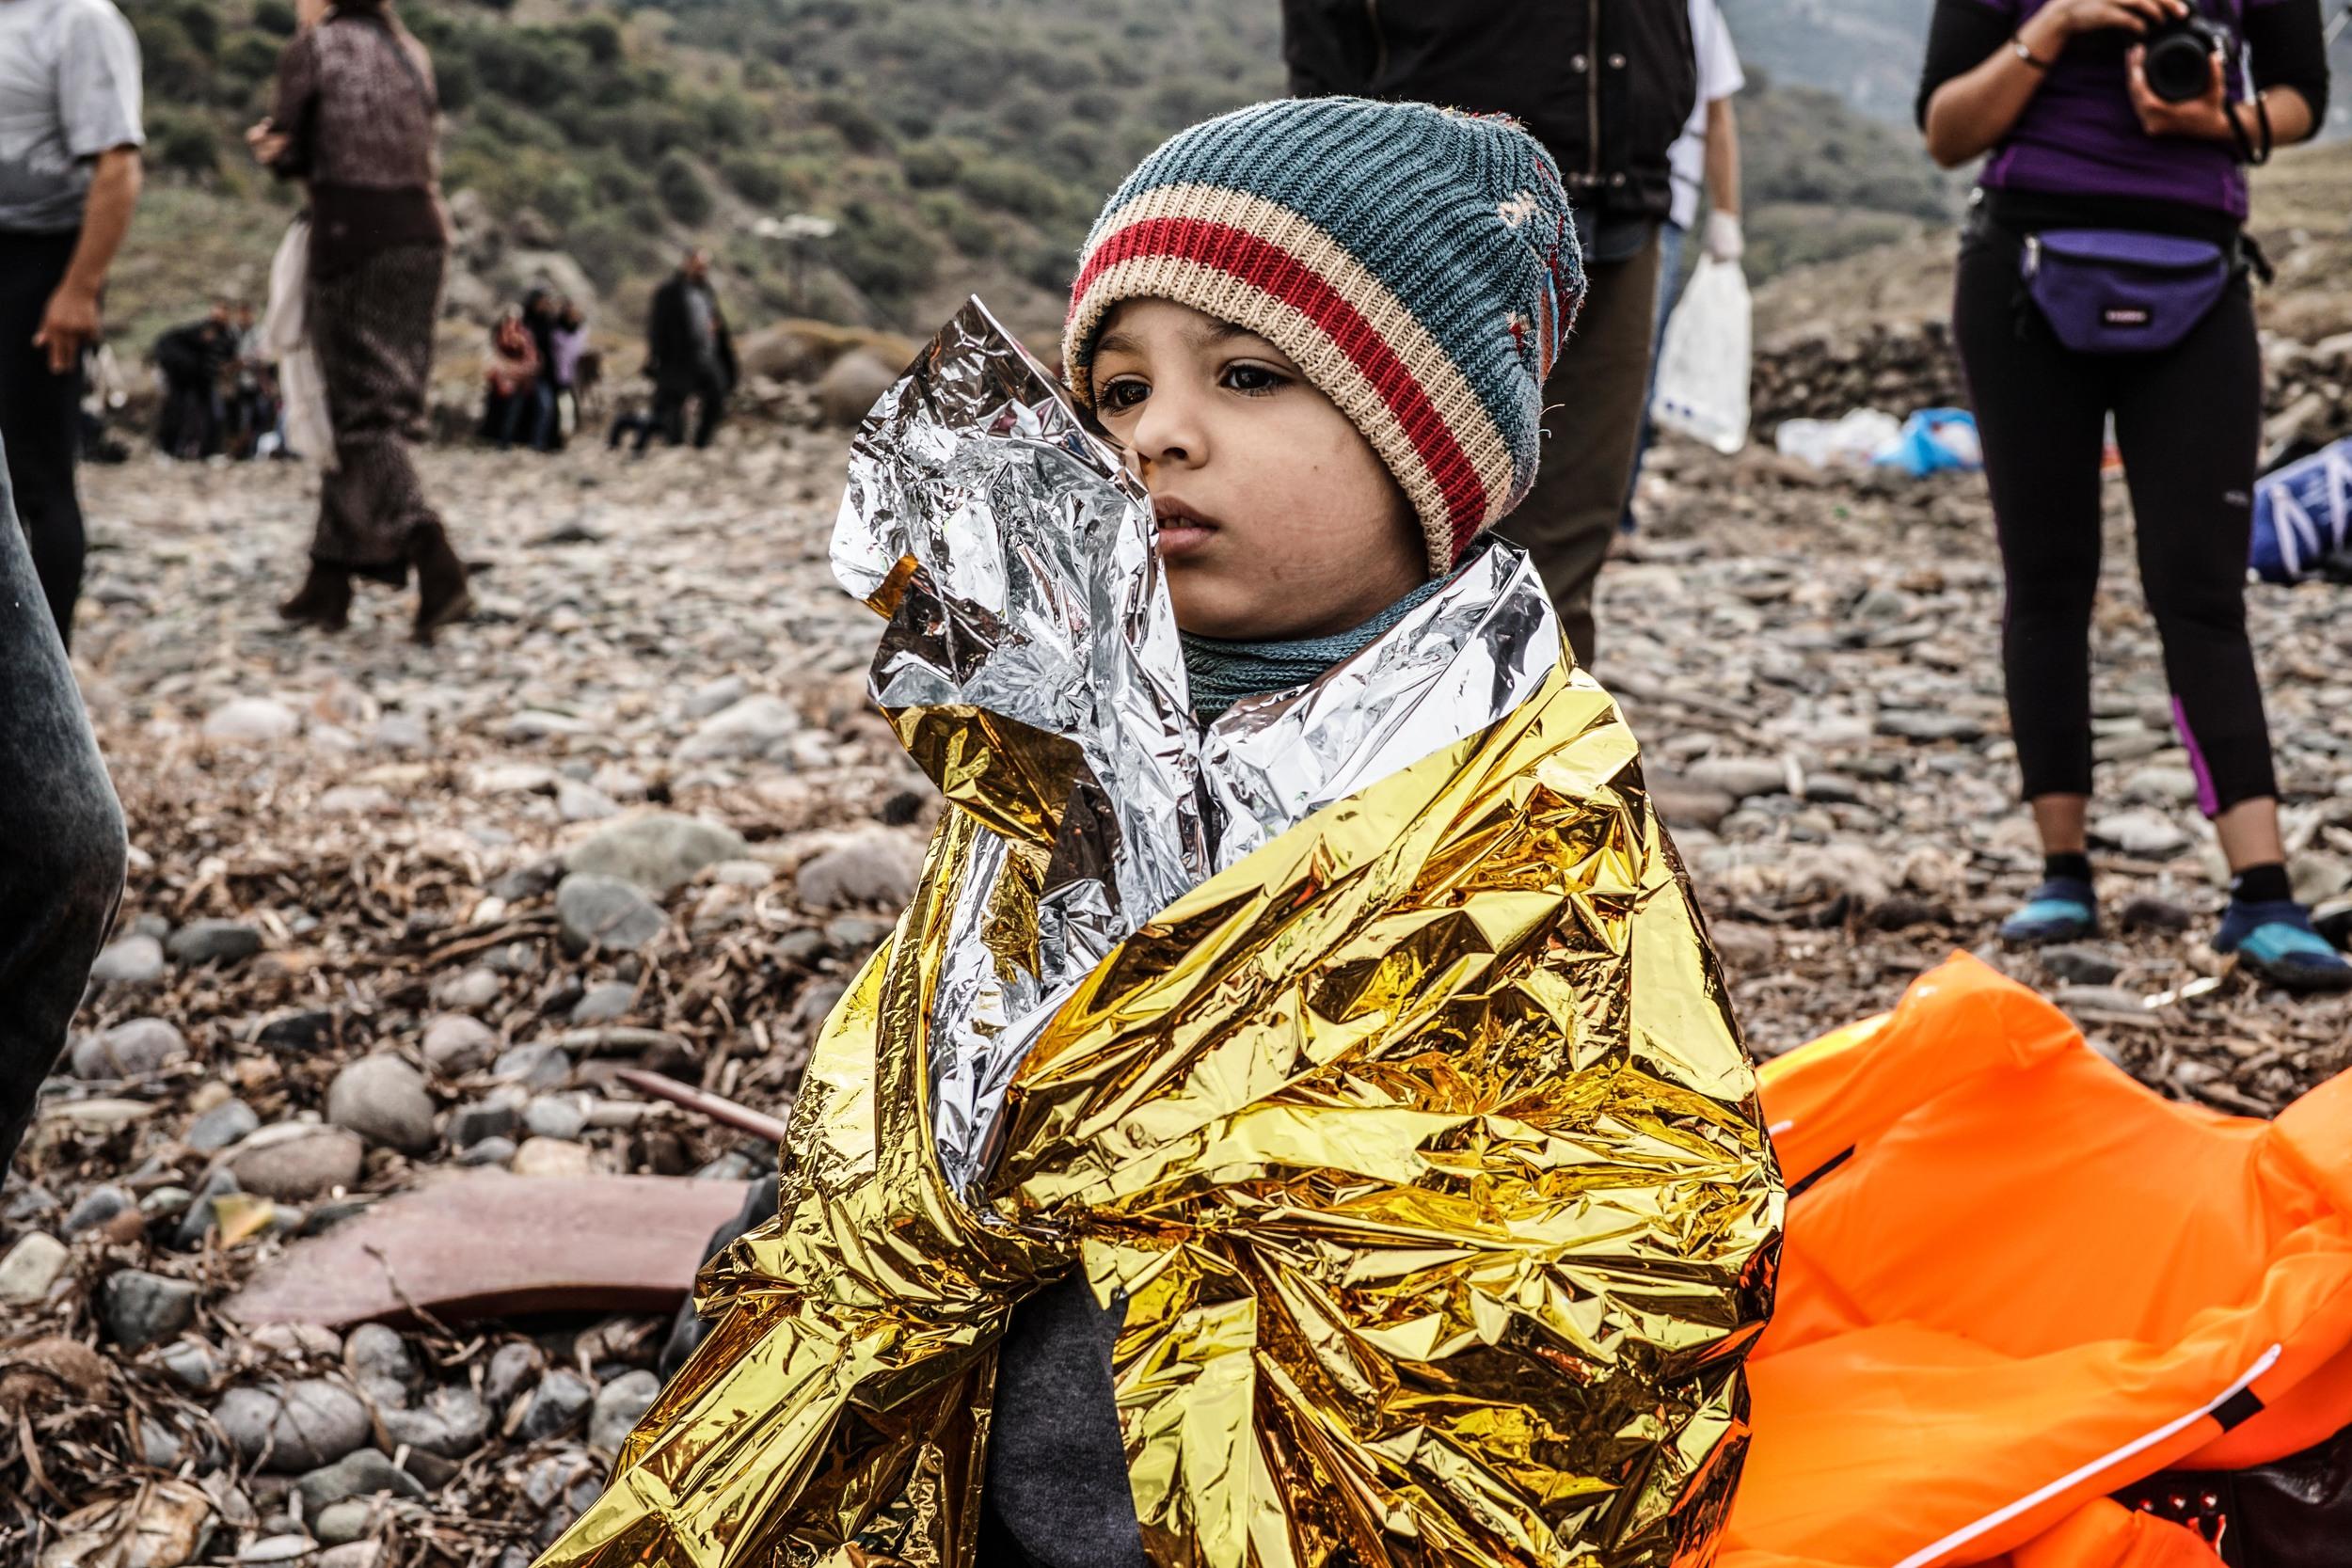 Syrian Refugee Crisis Lesbos Greece November 2015 3.jpg